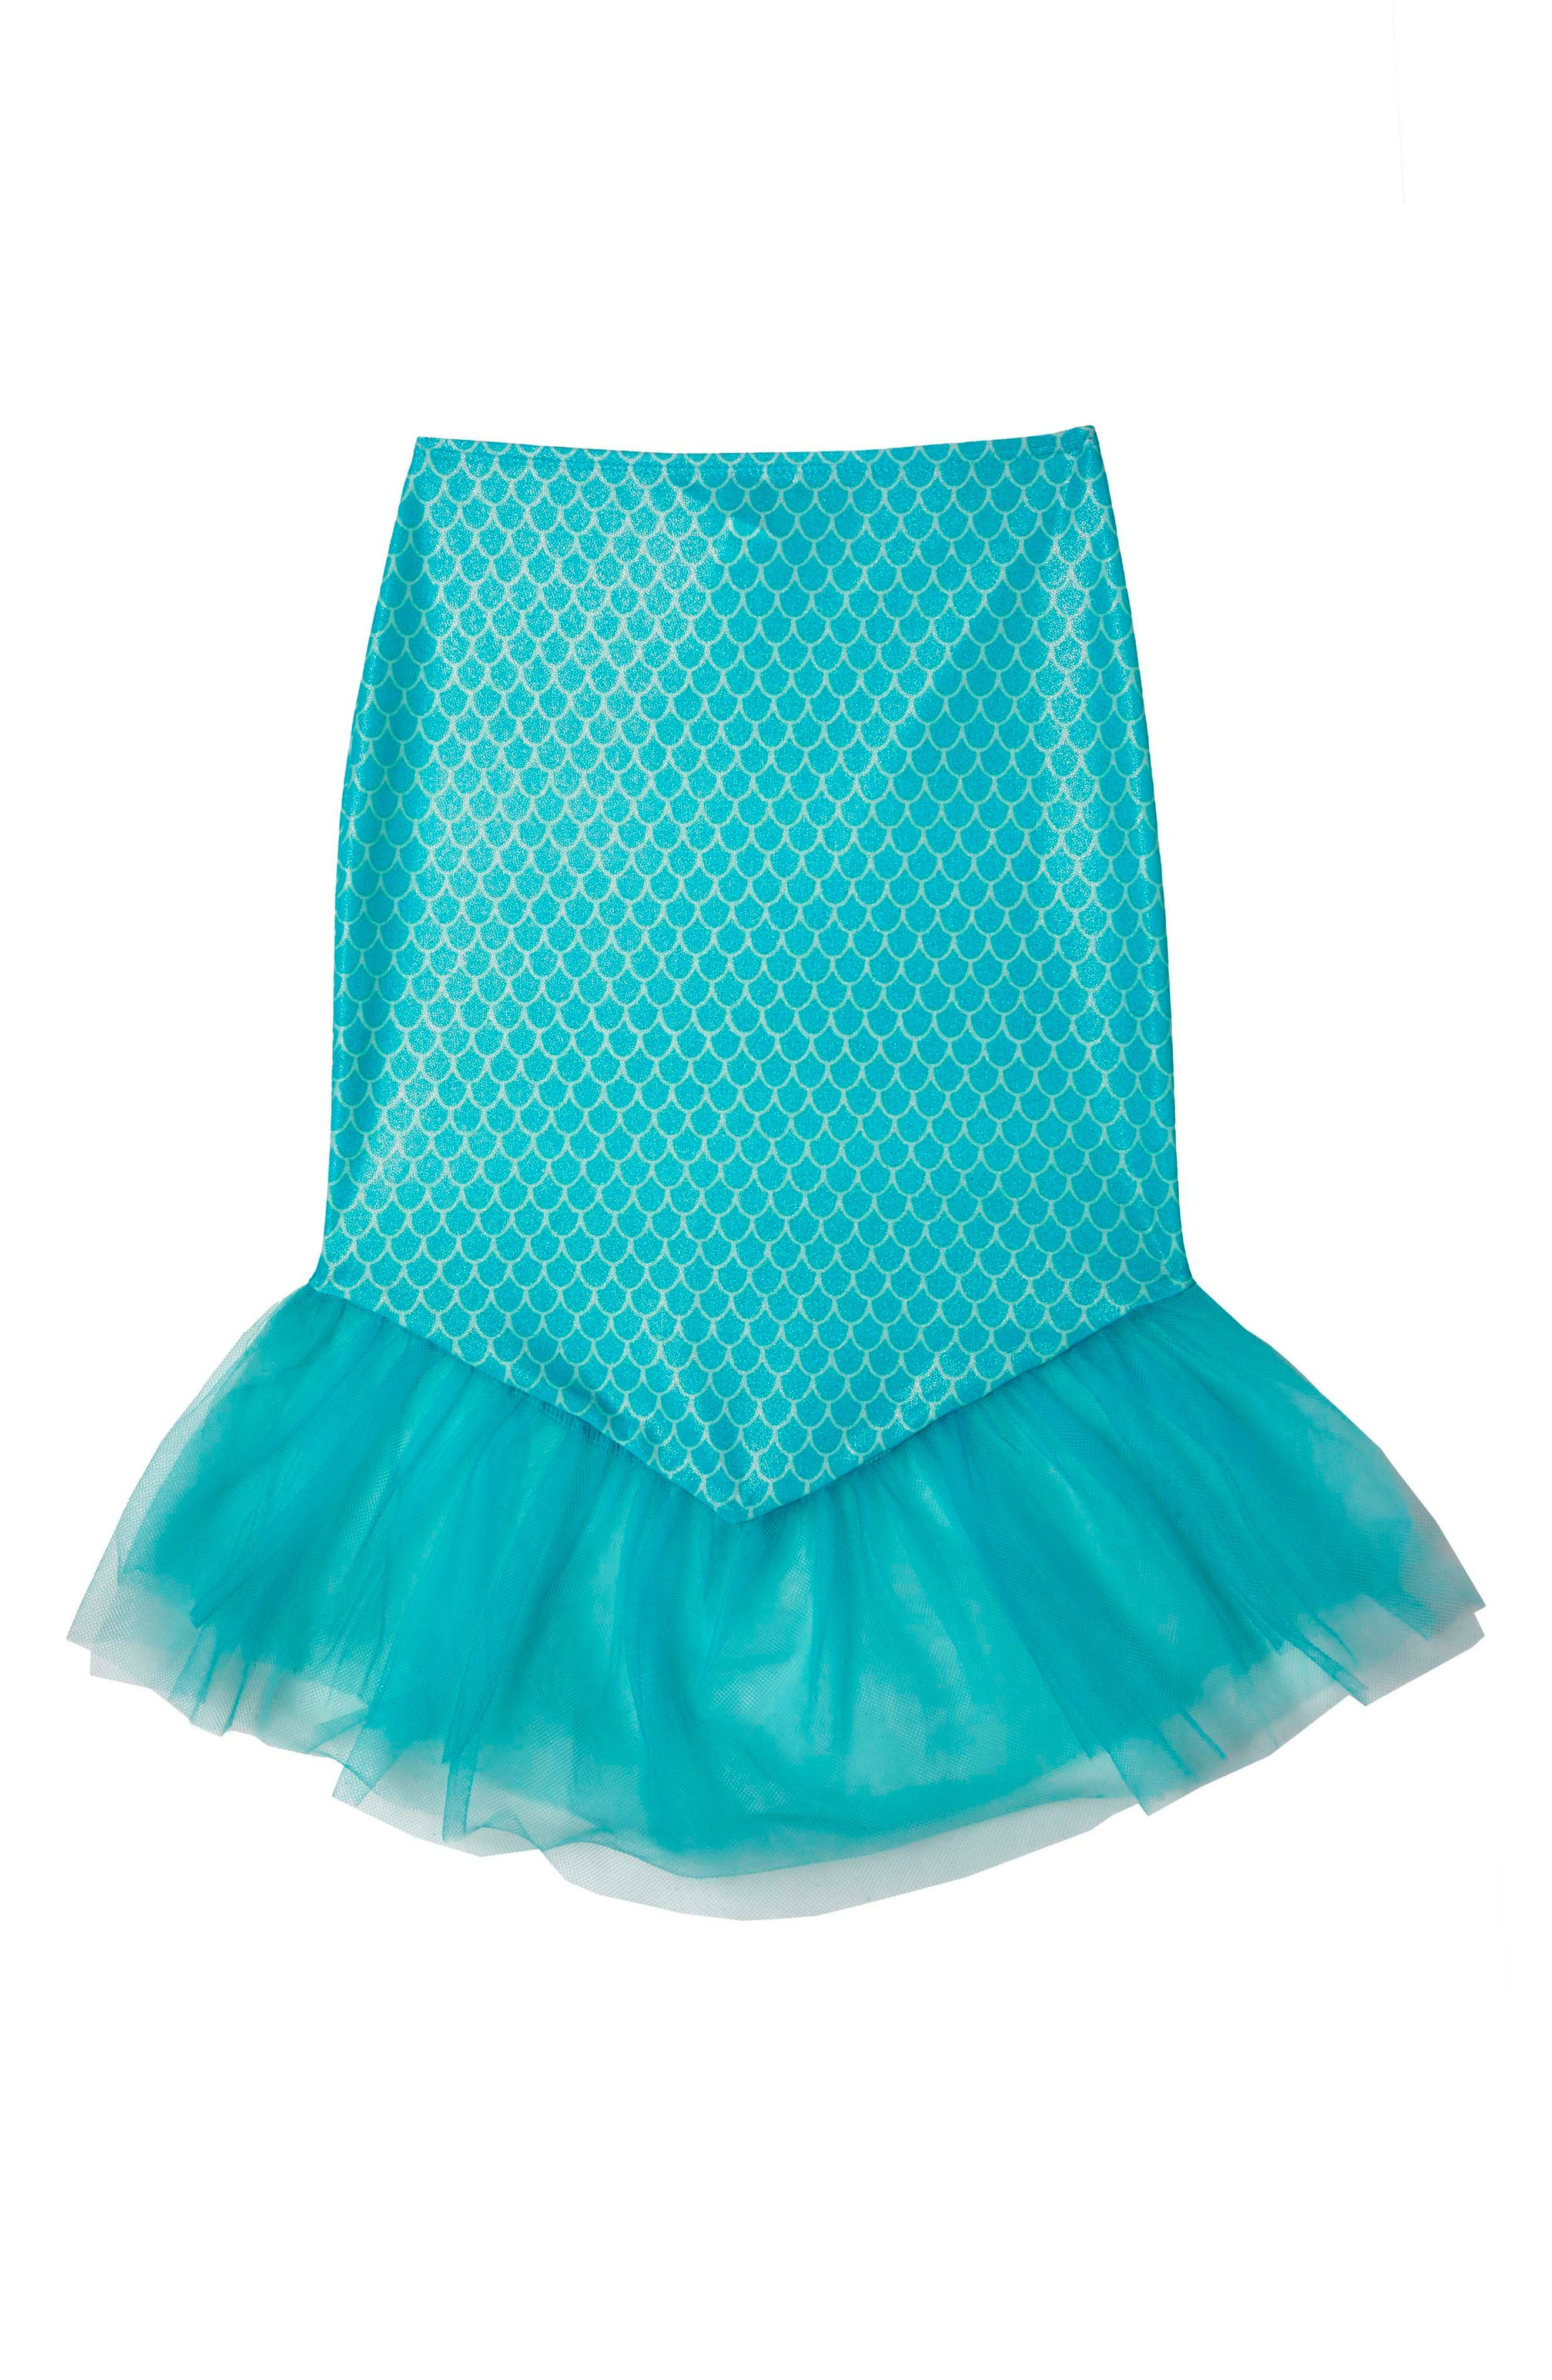 Mermaid Princess Cover-Up Skirt,                         Main,                         color, 400